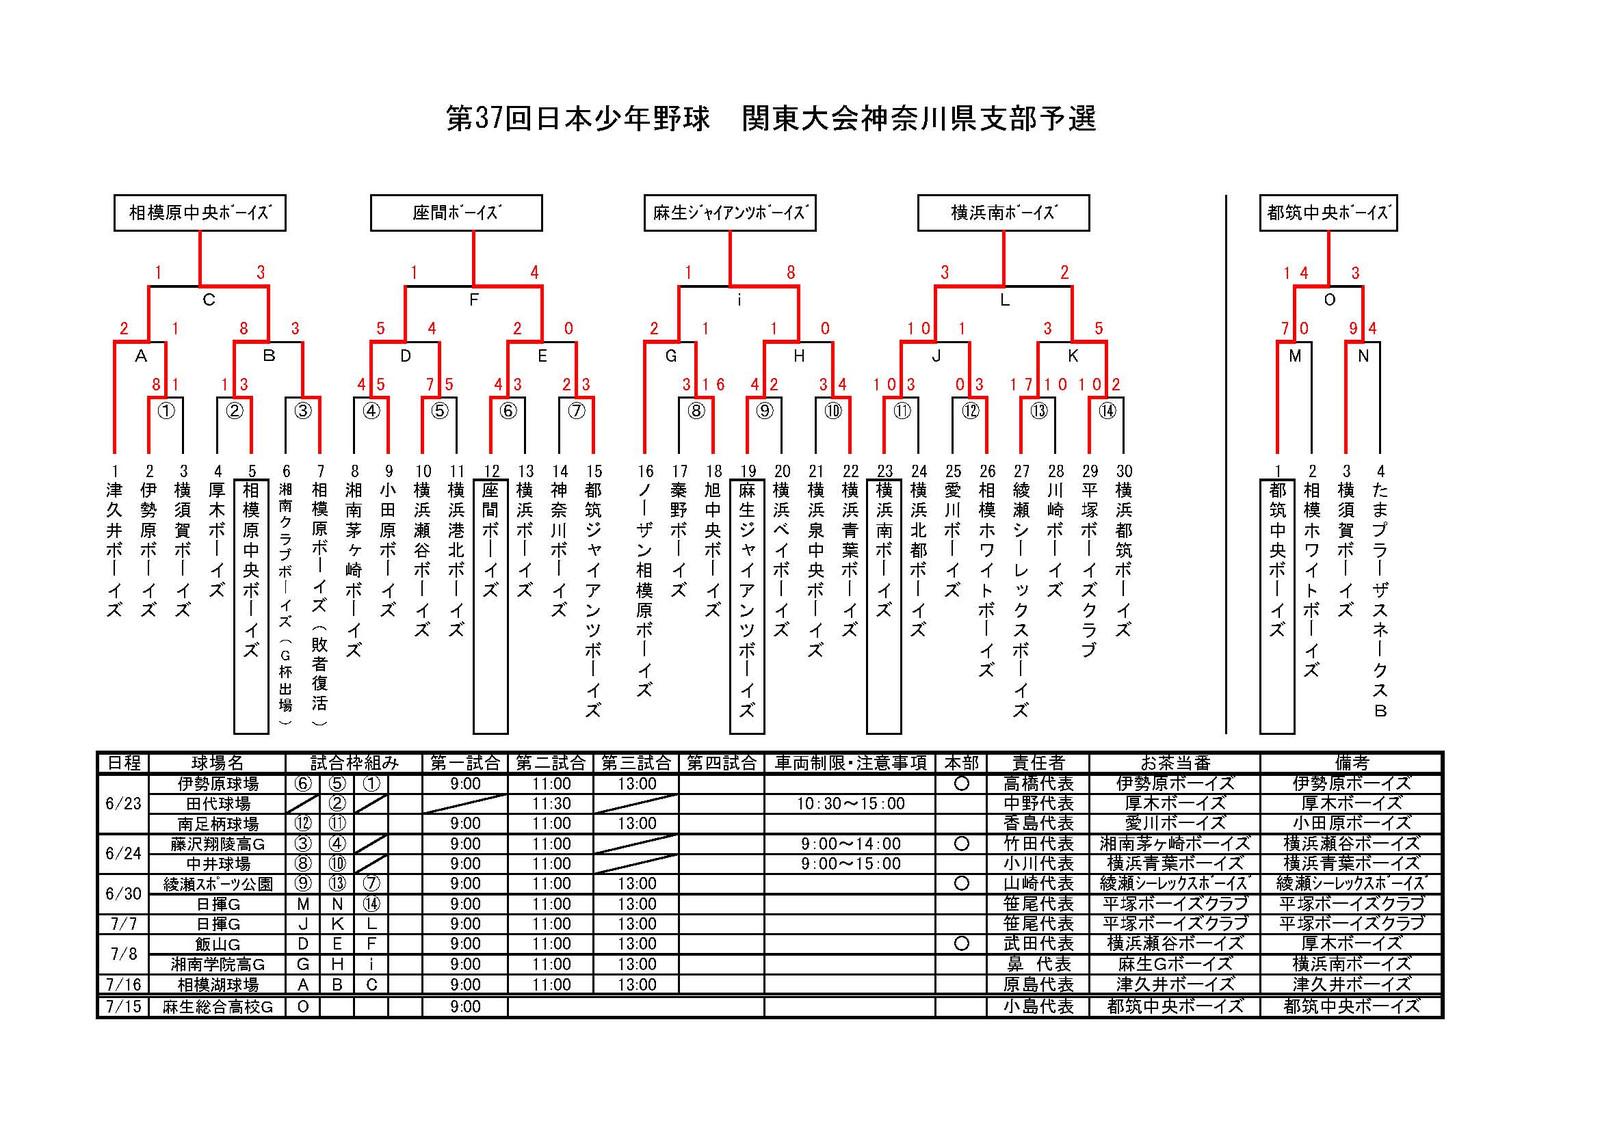 20120716_kanto_kanagawa_result